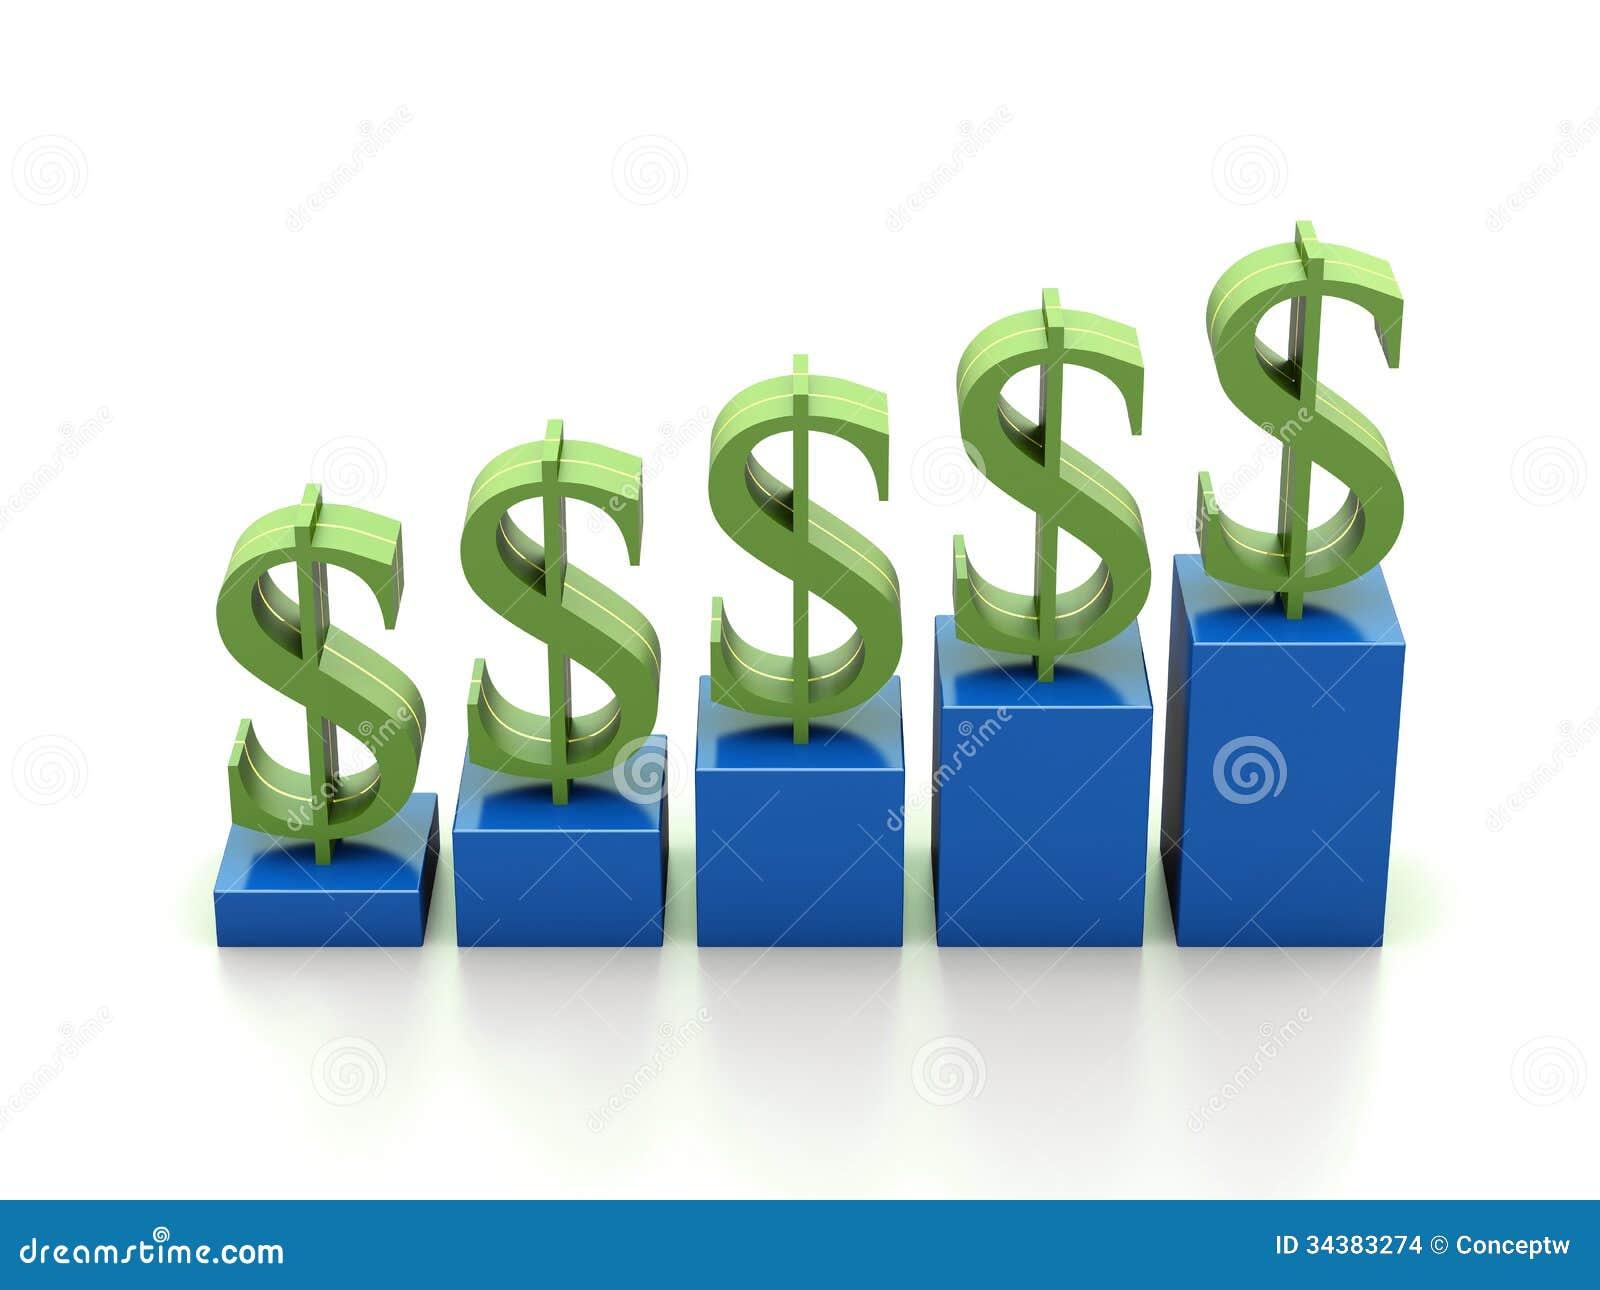 economic graph stock illustration illustration of business 34383274